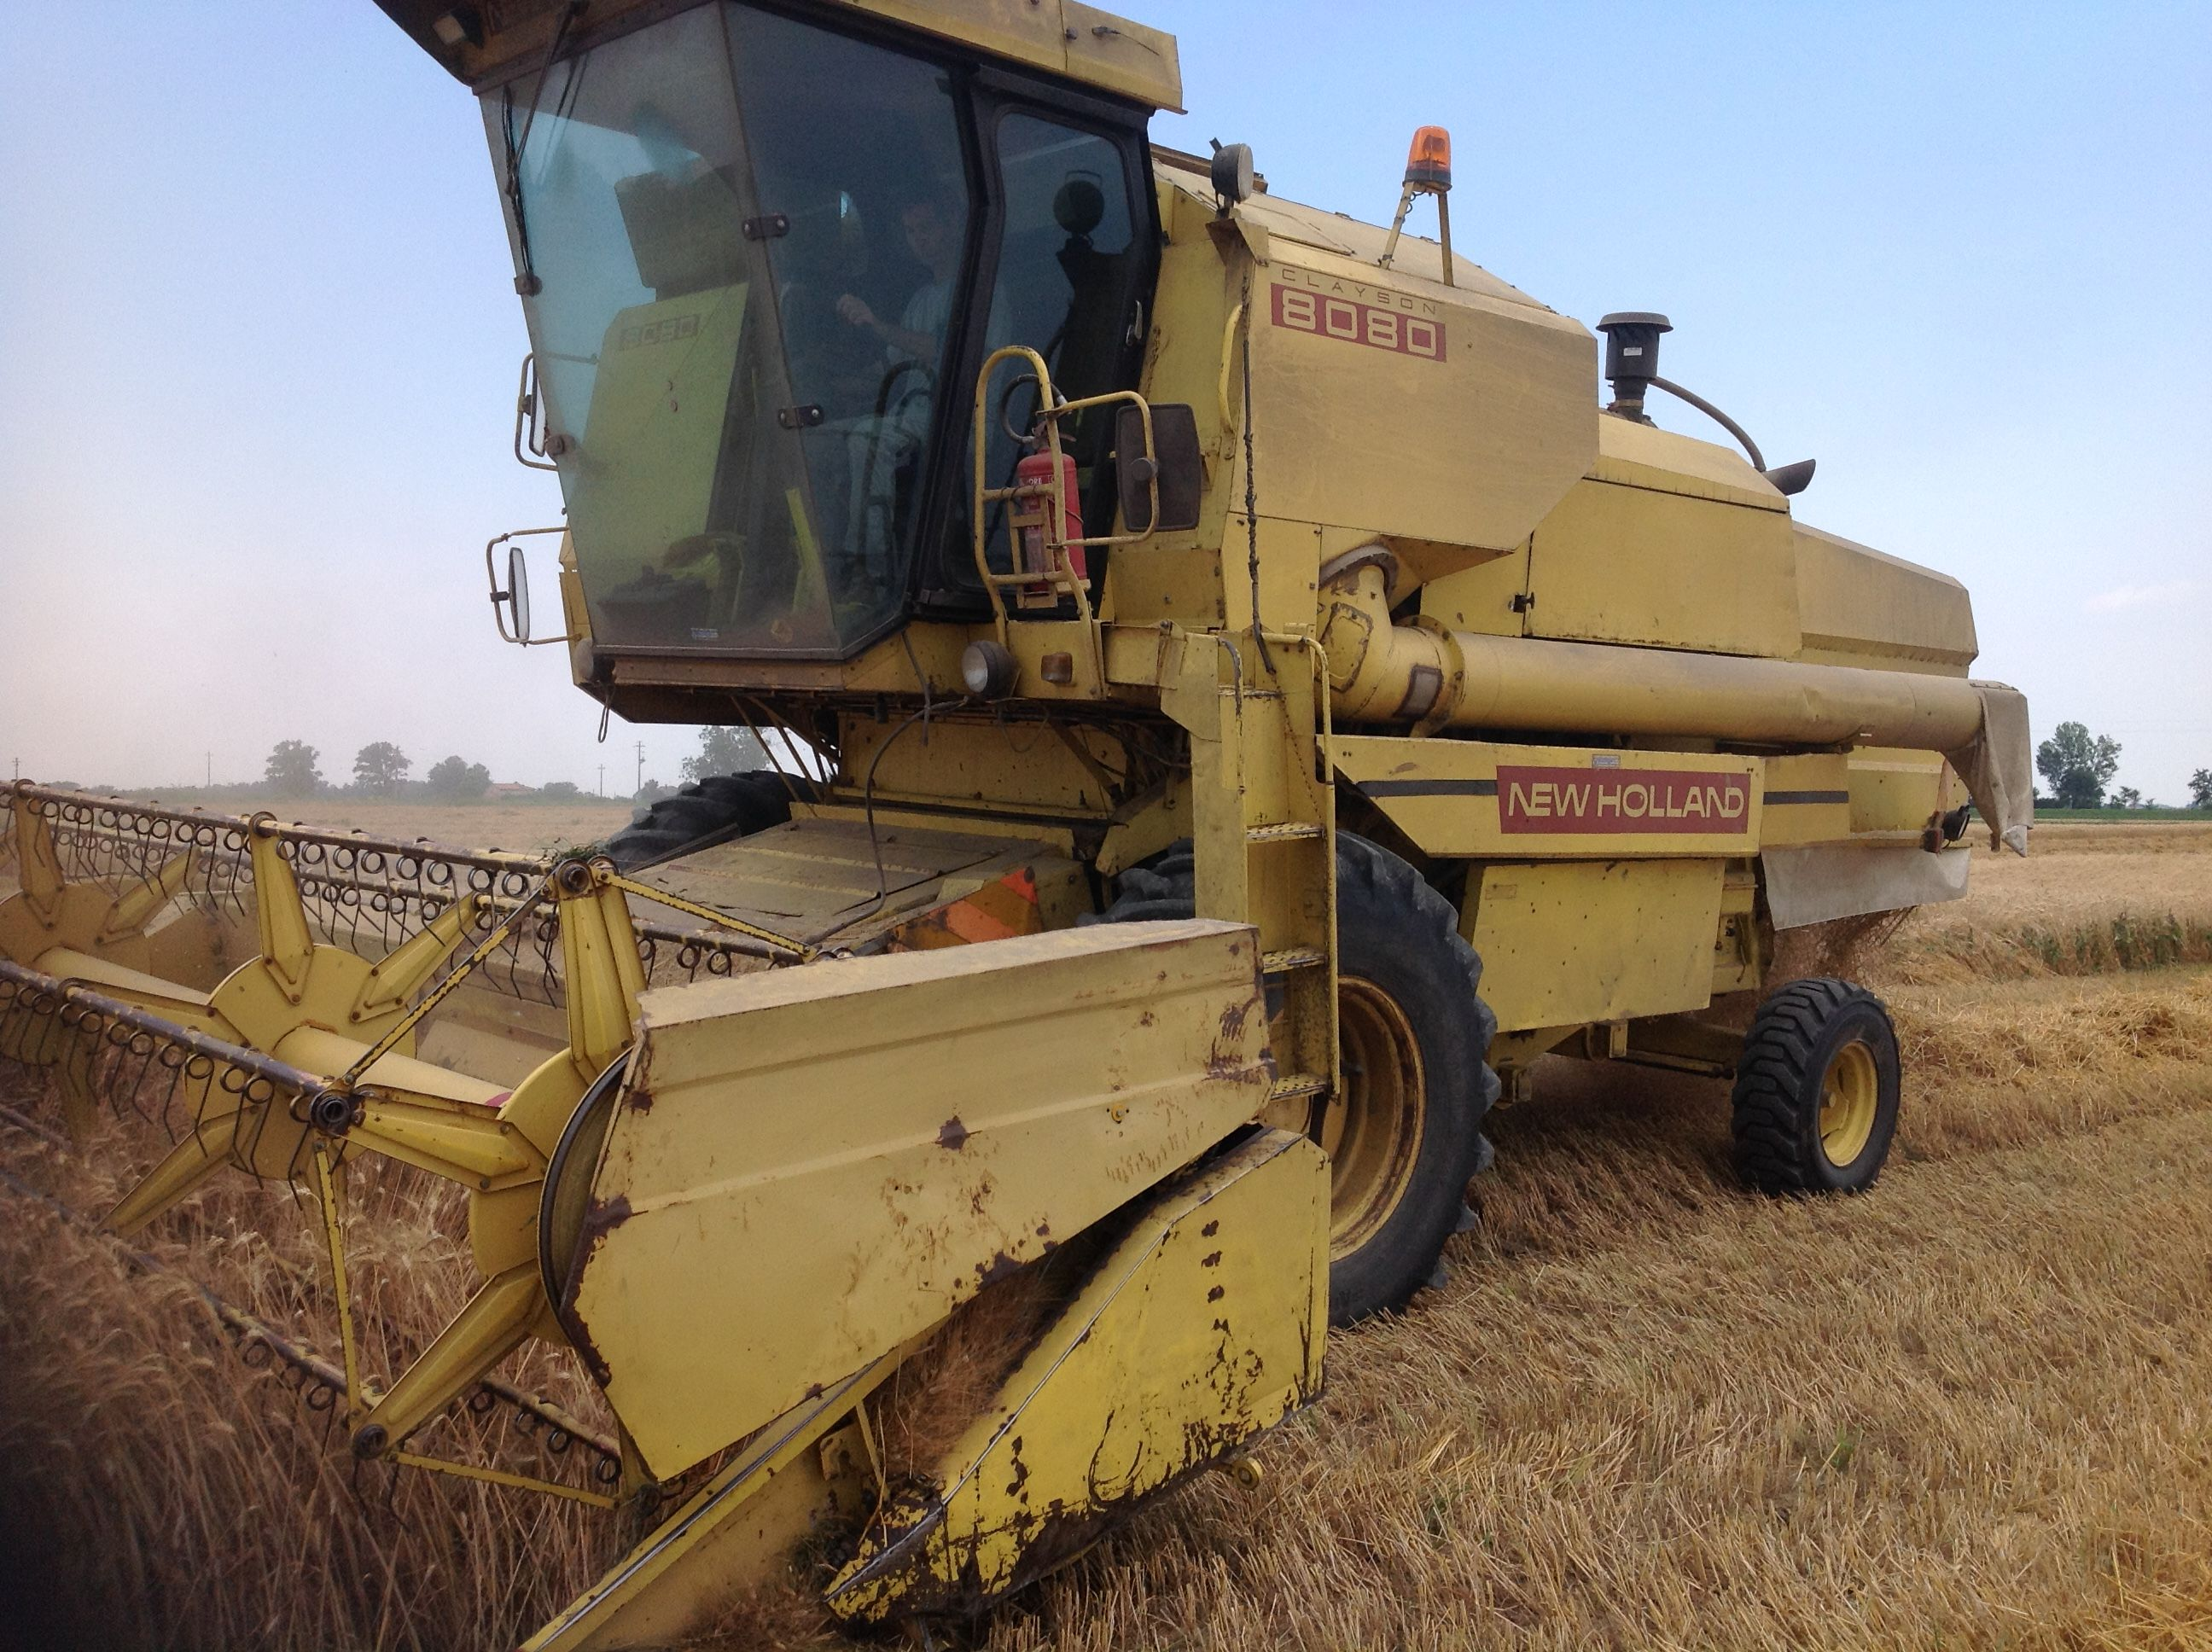 Pin By Mike Jorgenson On Farm Equipment Farm Equipment New